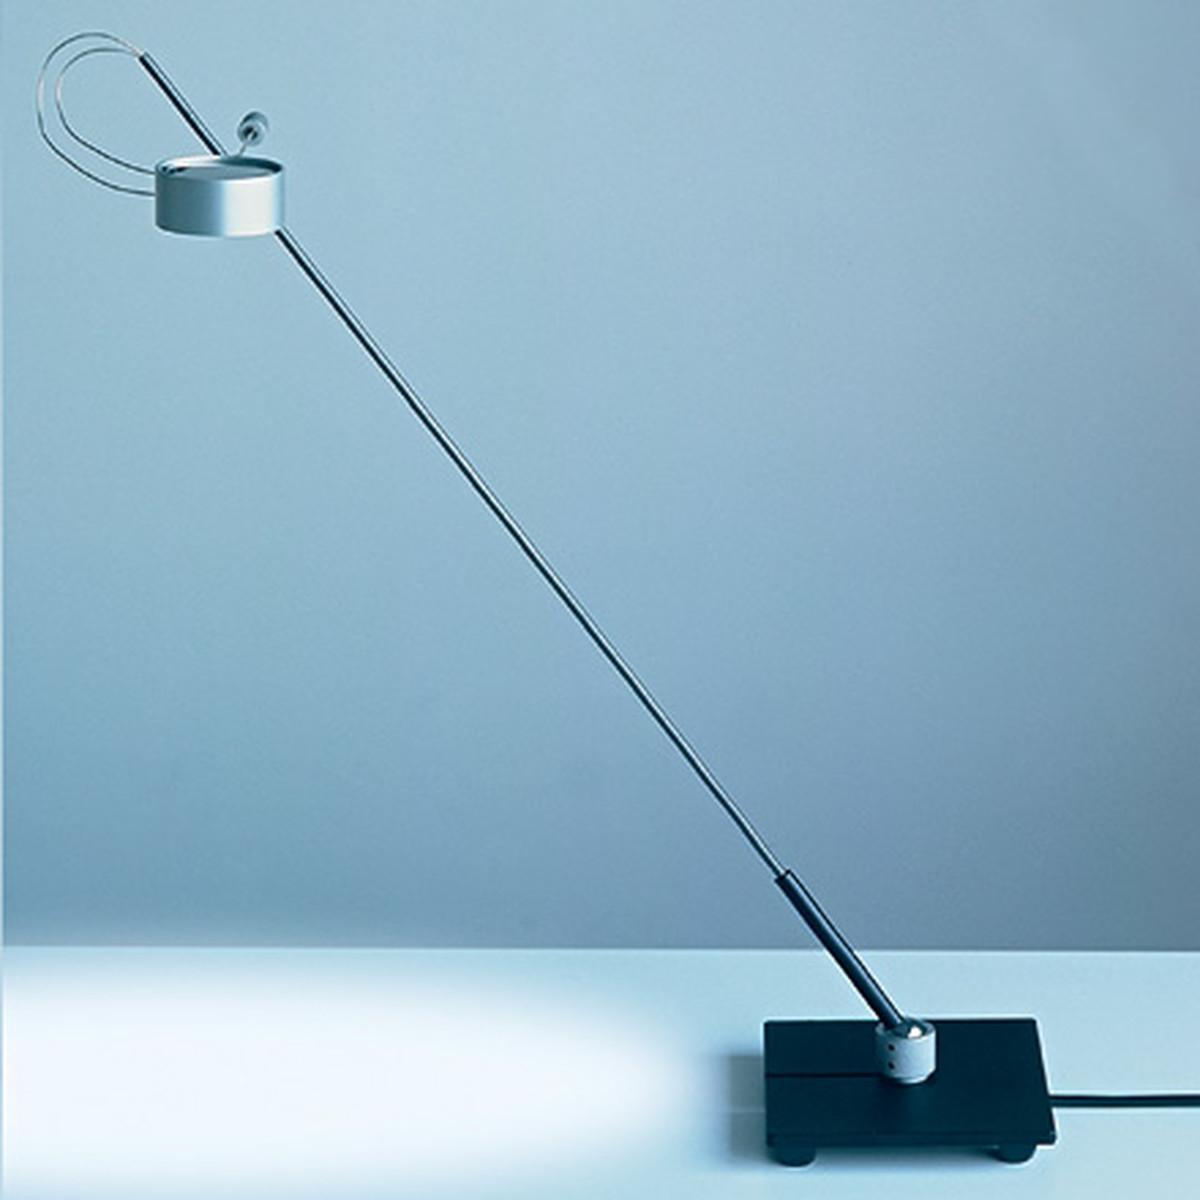 die absolut lighting standleuchte 50 watt. Black Bedroom Furniture Sets. Home Design Ideas